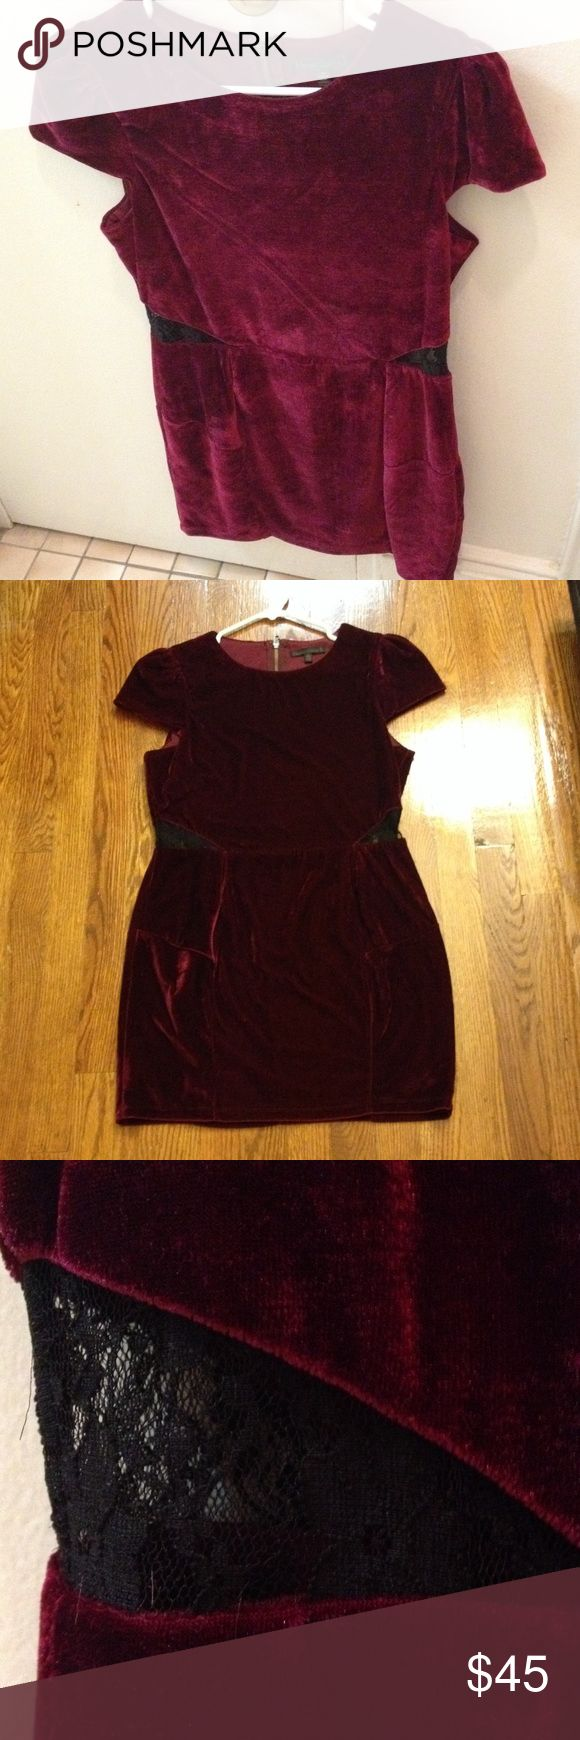 Deep Maroon Velvet Dress Luxurious deep reddish-violet velvet short-sleeved dress with peekaboo black lace cutout above hips. Dress hits above knee. Long gold zipper detail on back. Lucca Couture Dresses Mini